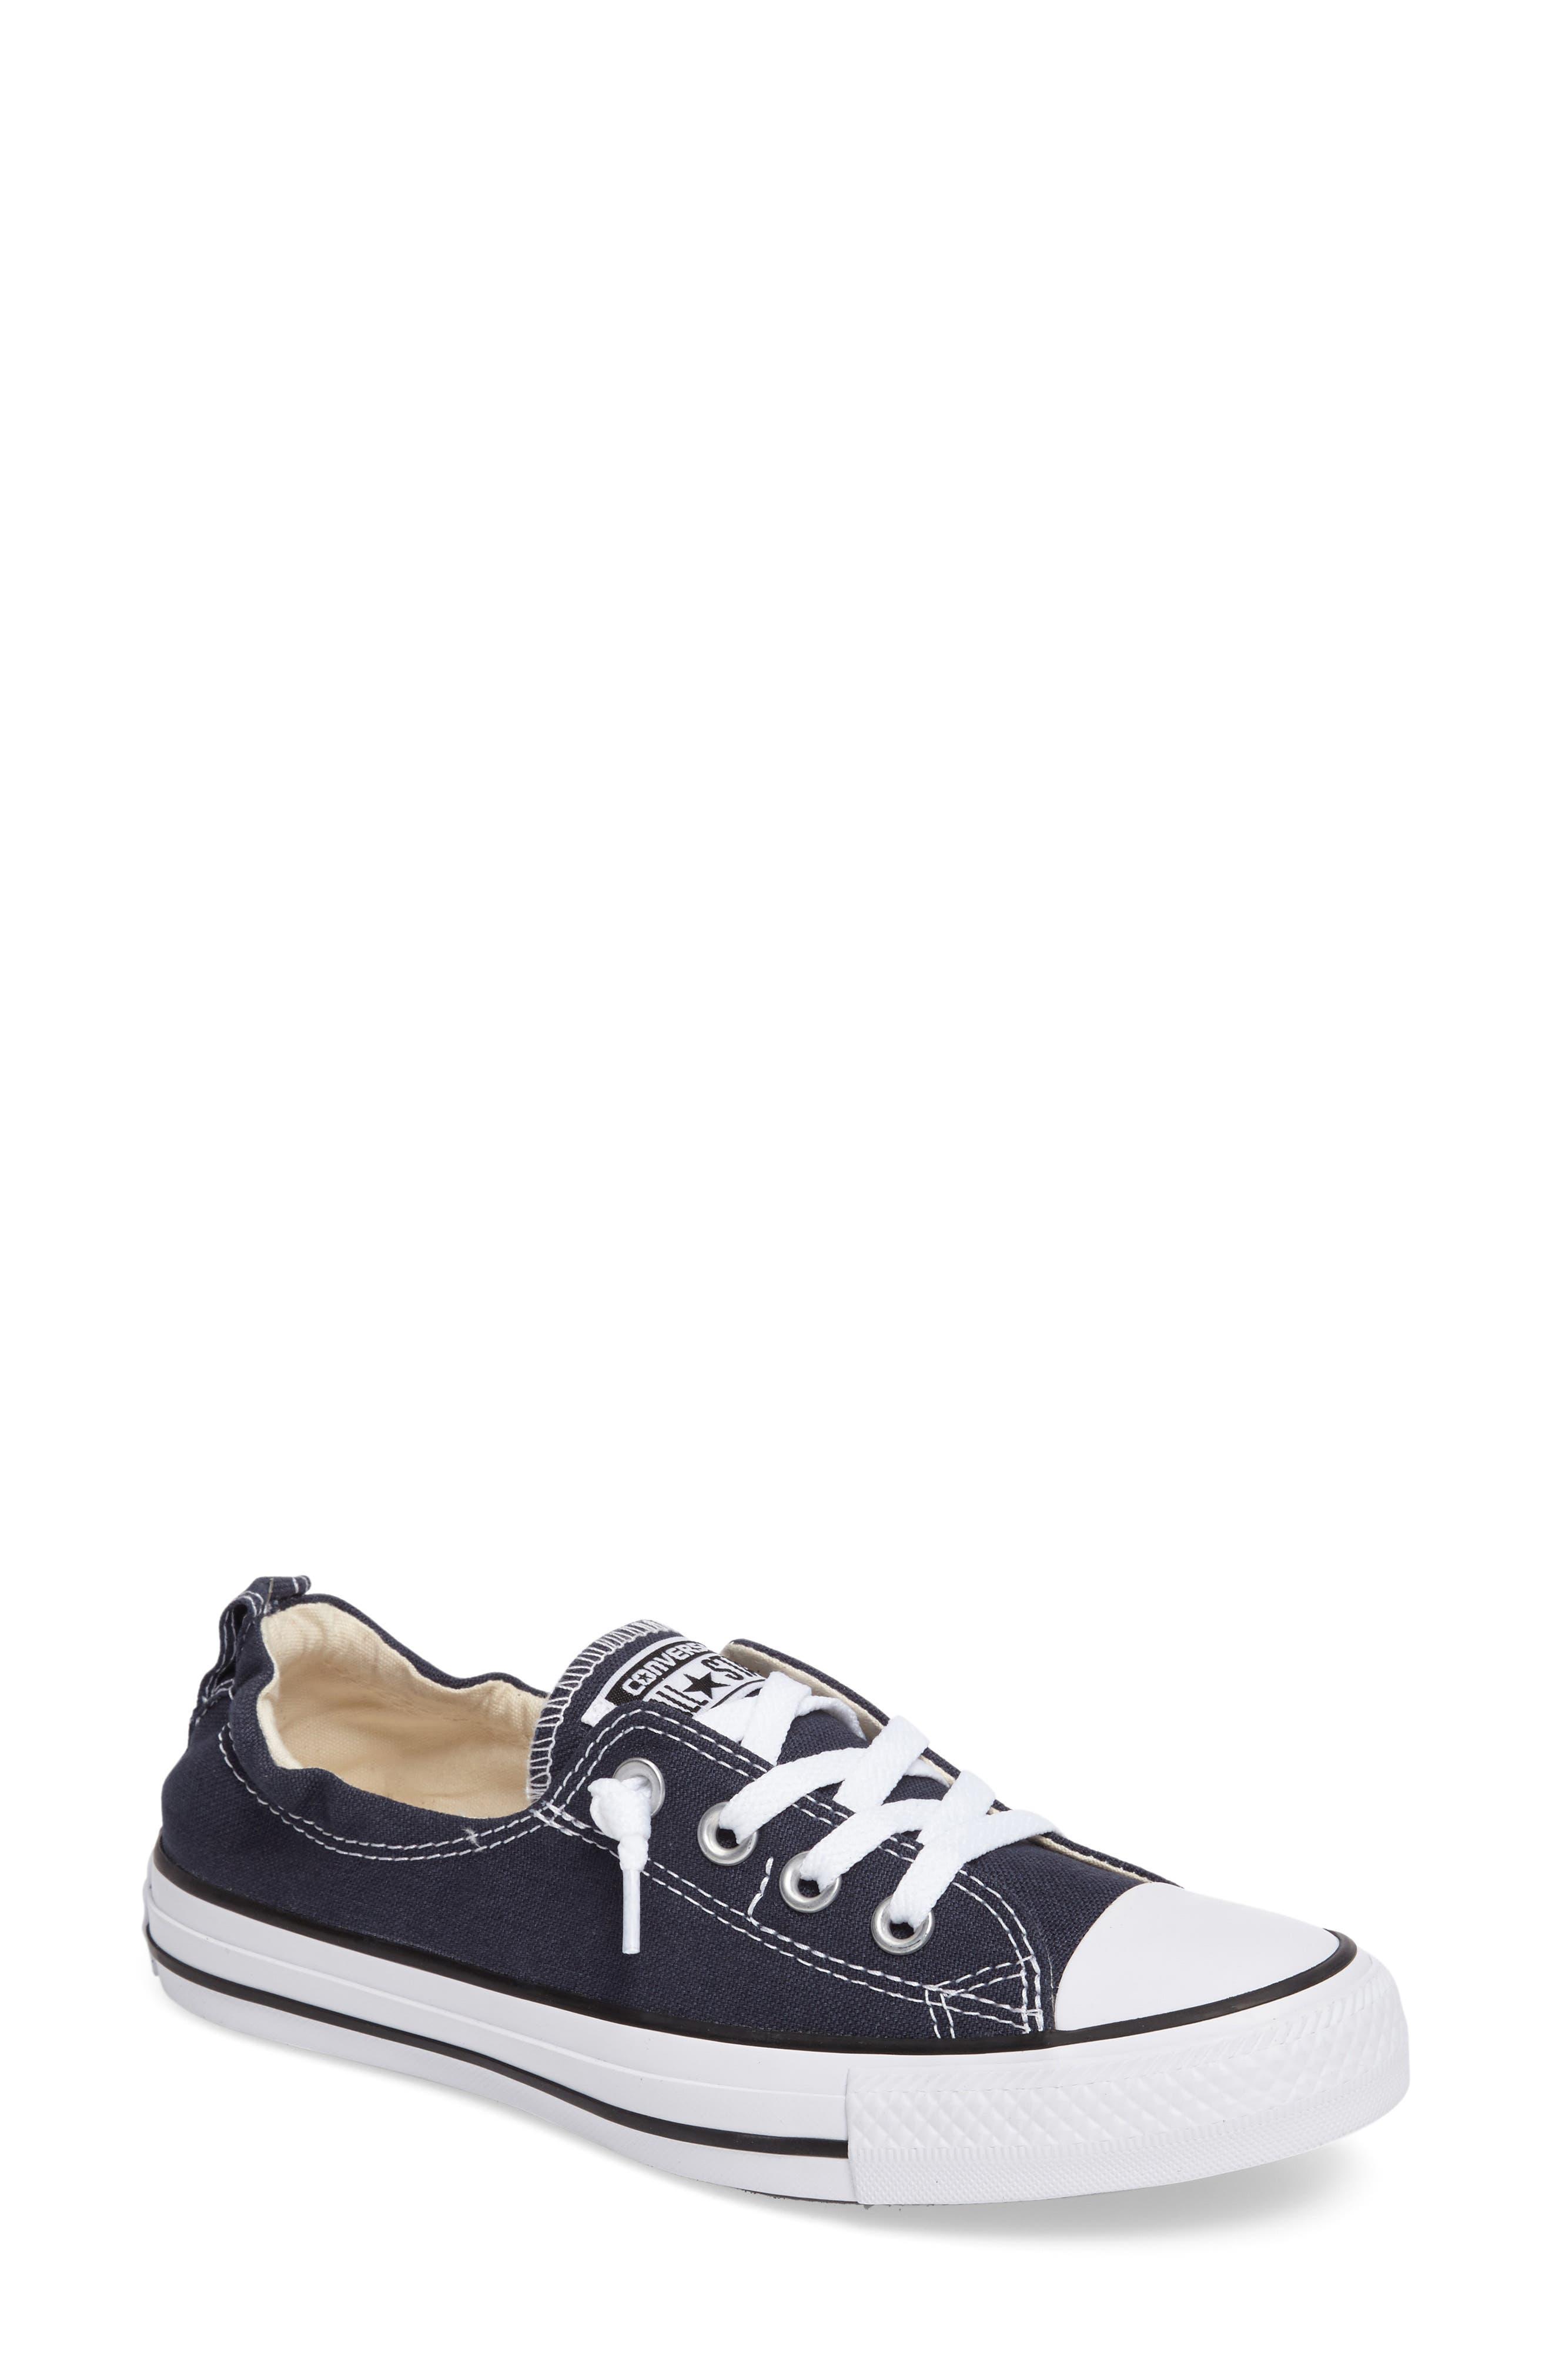 CONVERSE Chuck Taylor<sup>®</sup> 'Shoreline' Sneaker, Main, color, NAVY